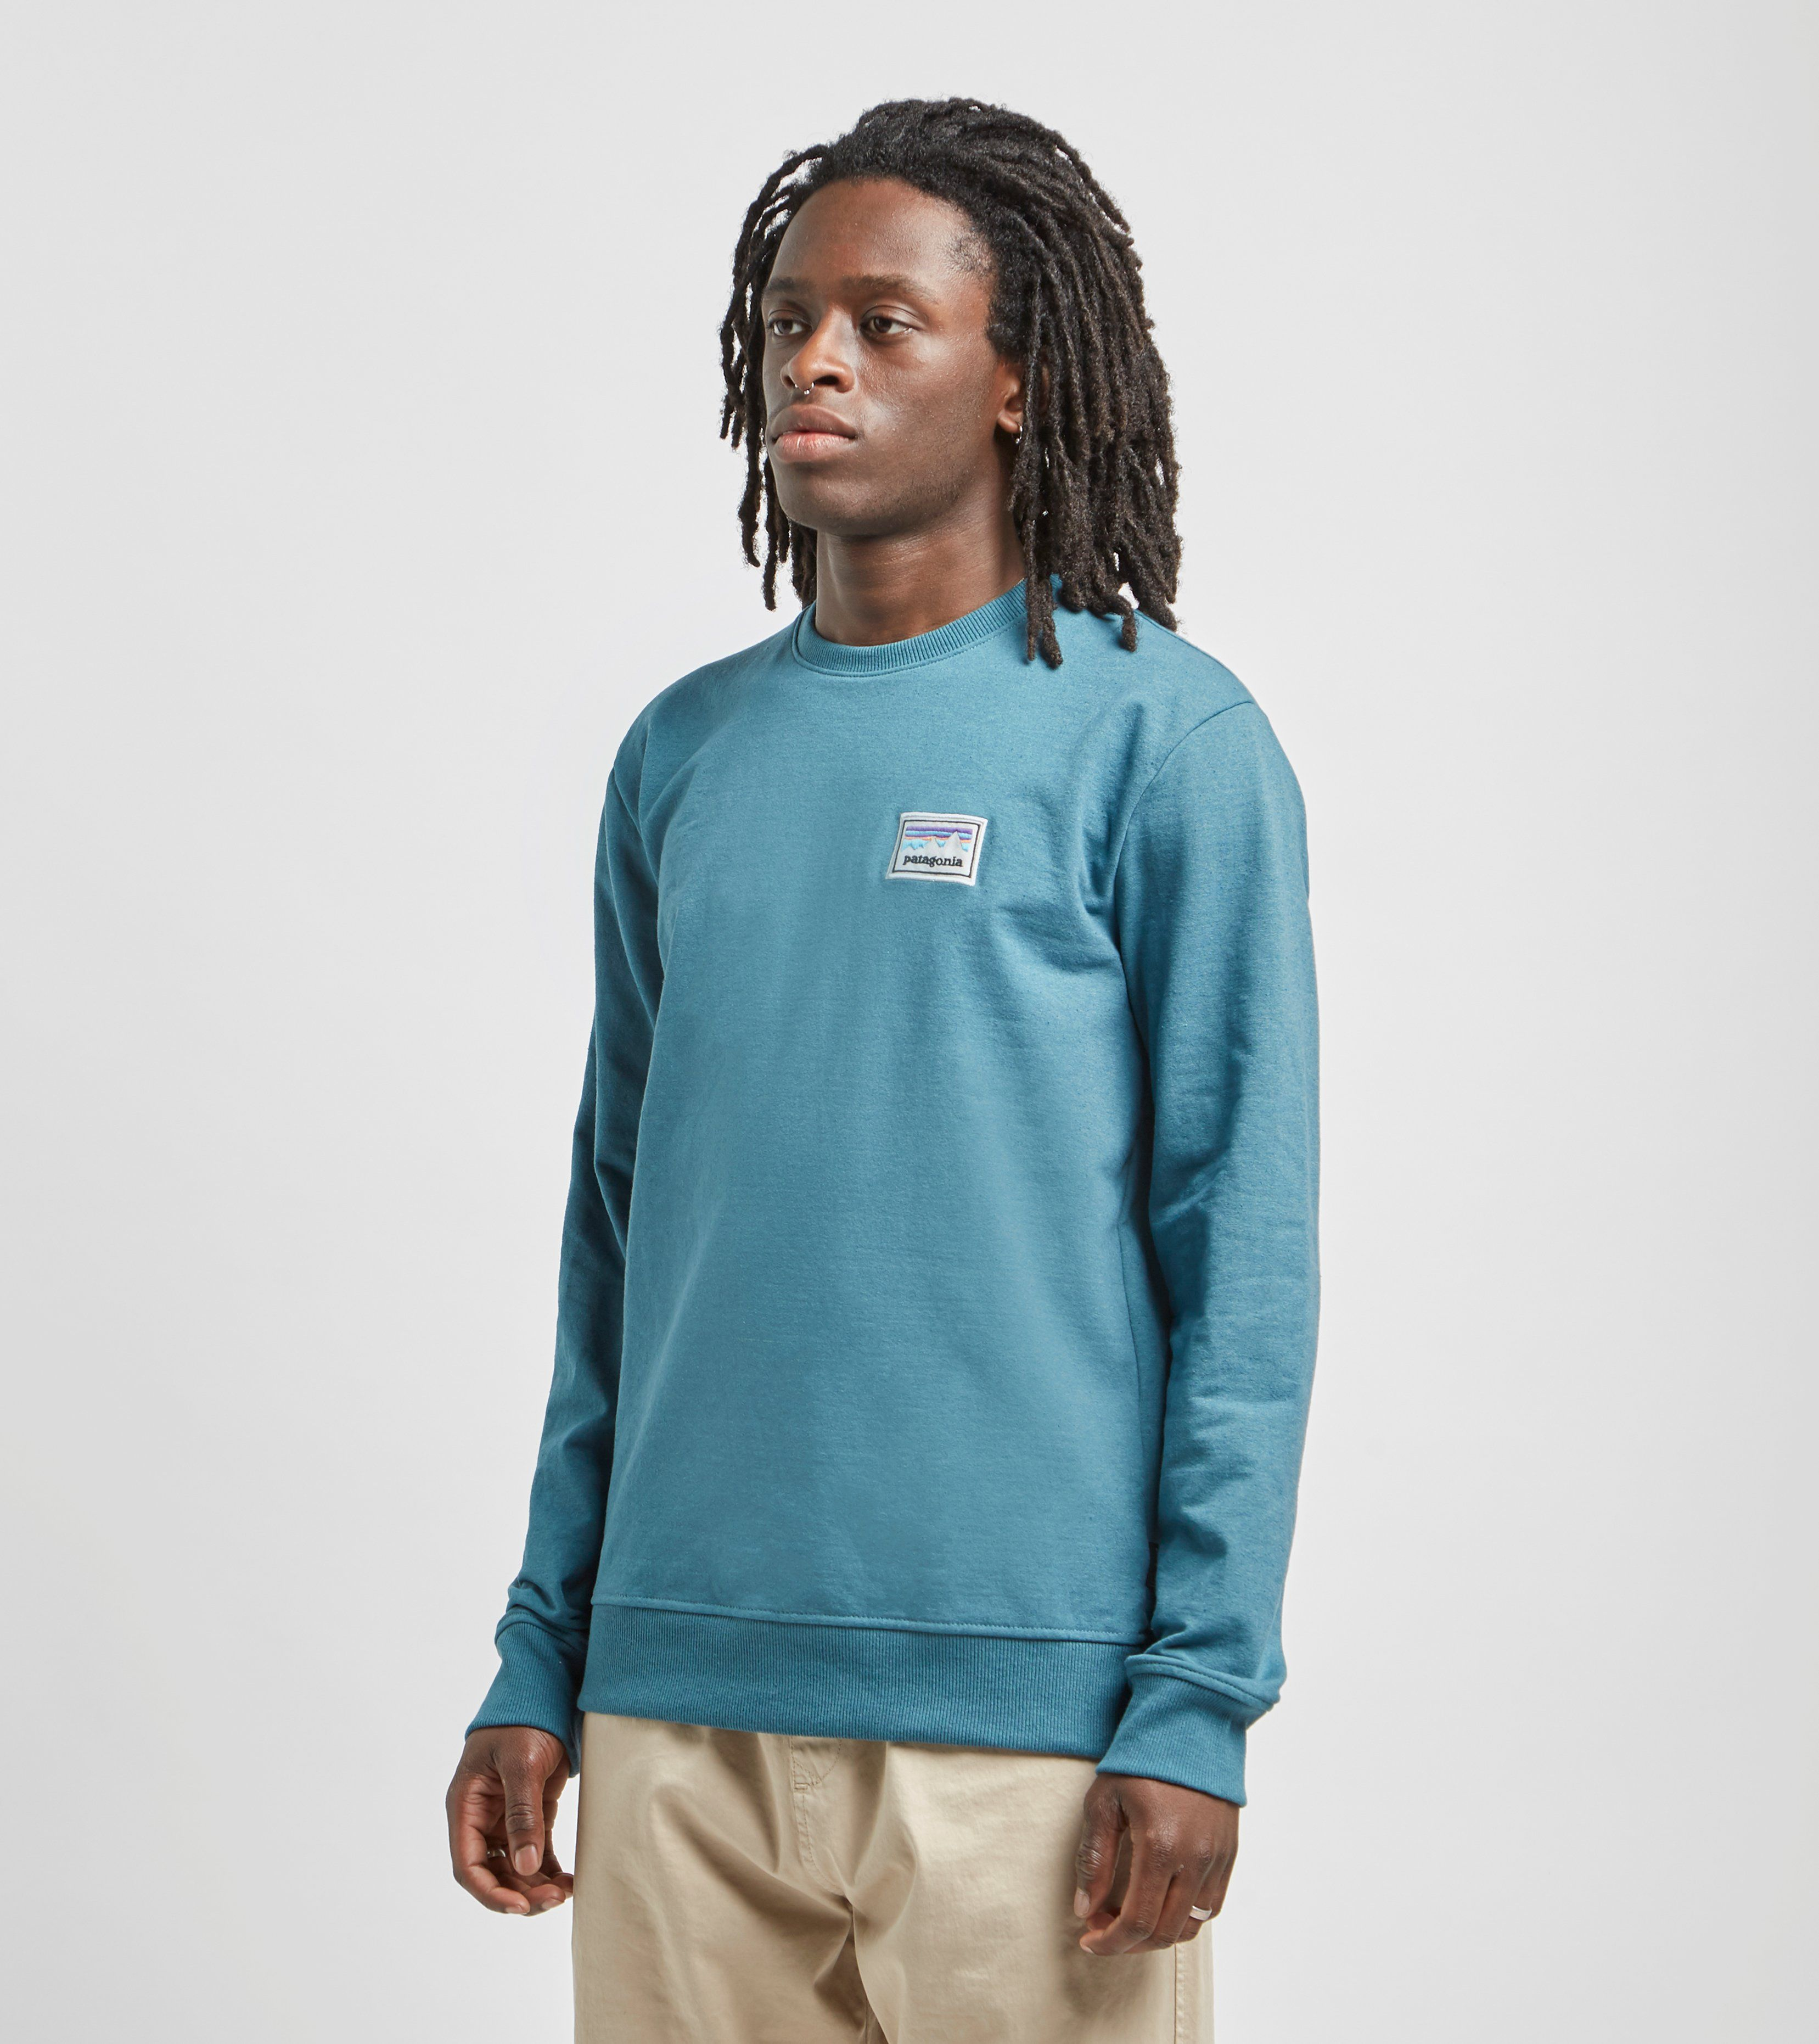 Patagonia Shop Sticker Crewneck Sweatshirt